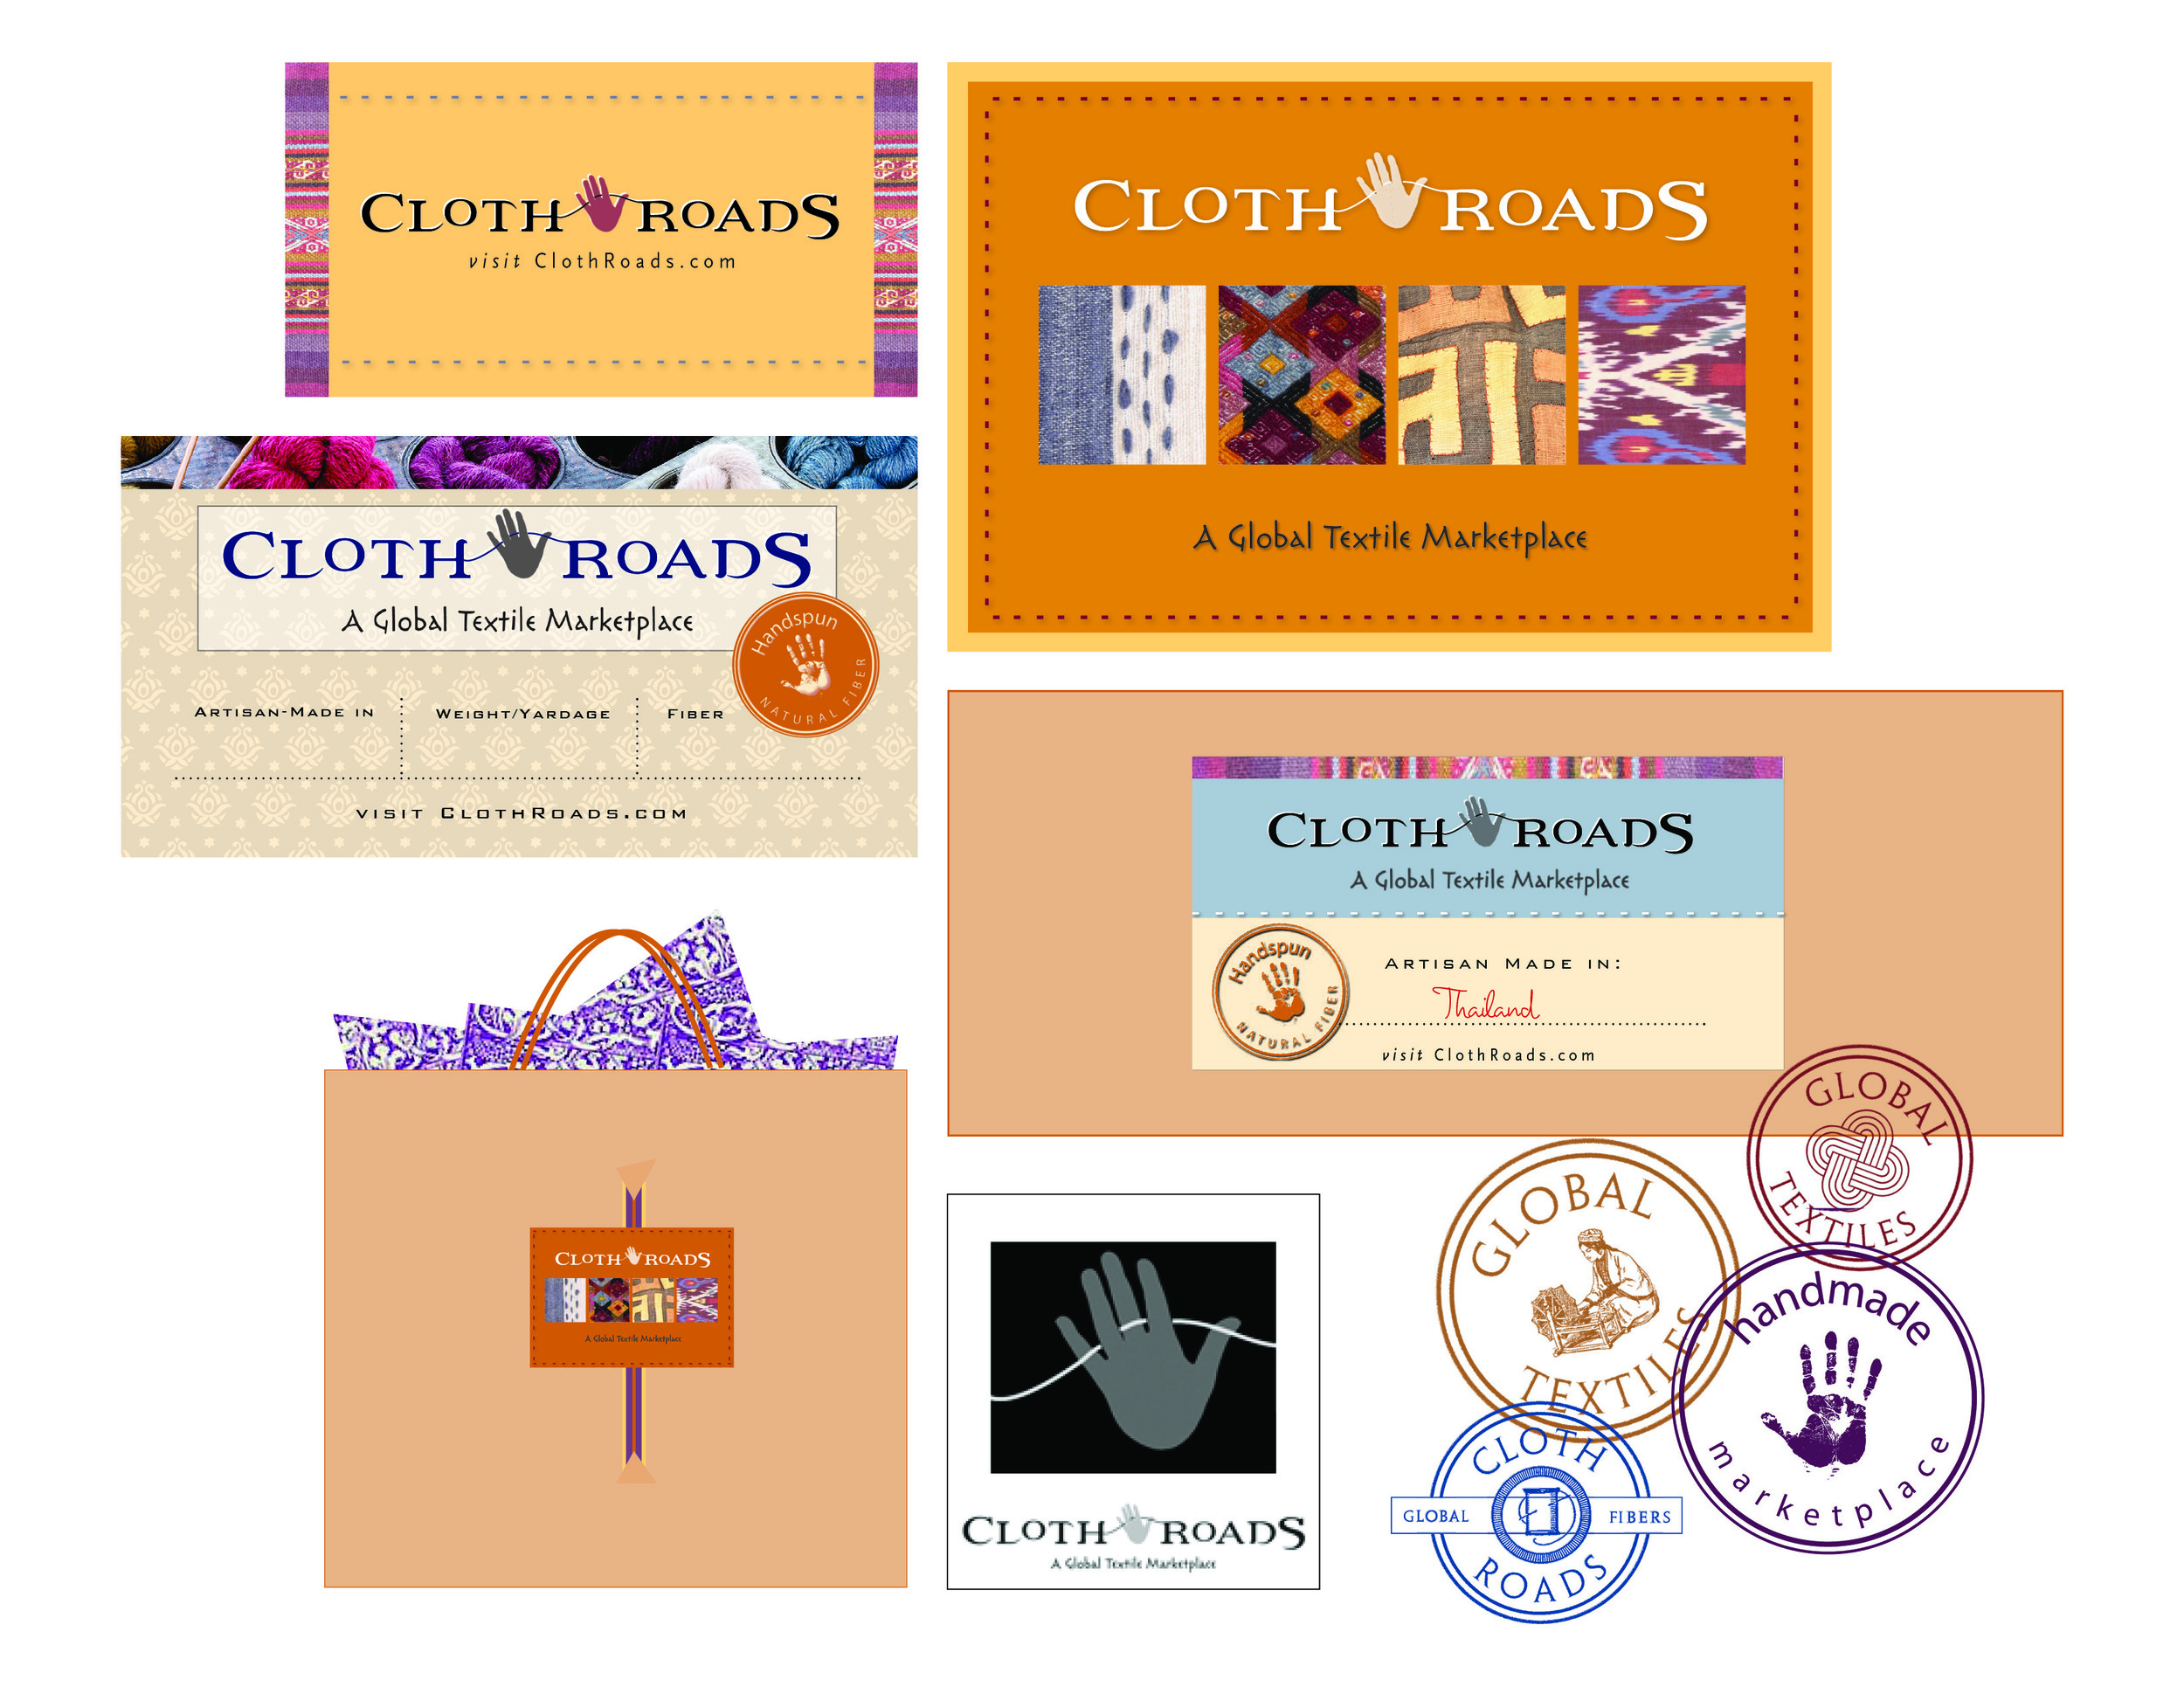 ClothRoads Branding Materials